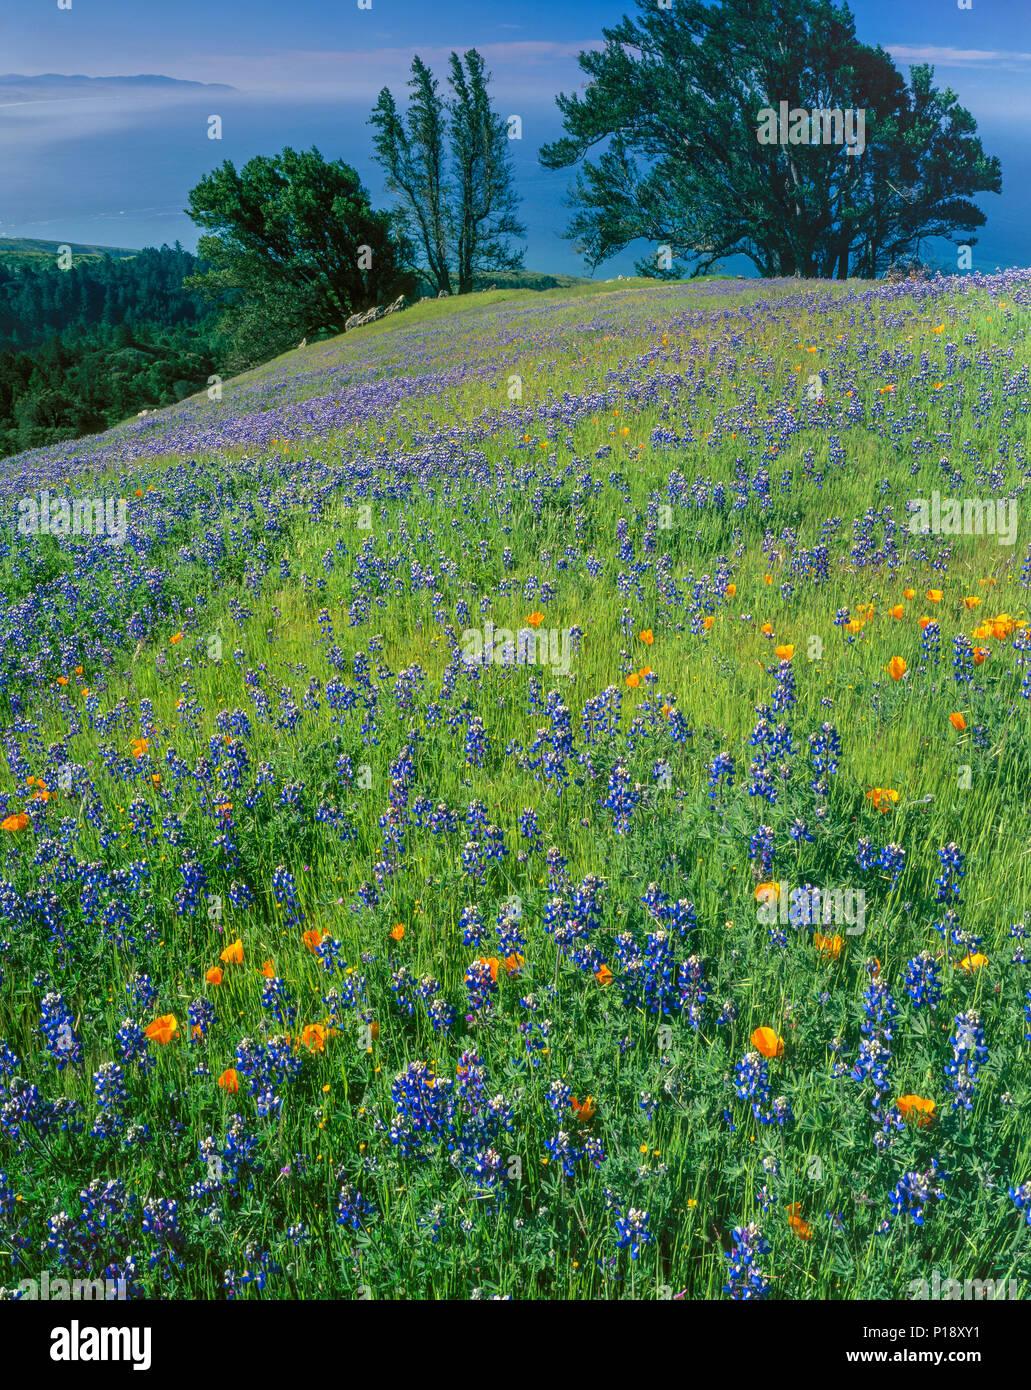 Lupin, Poppies, Bolinas Ridge, Mount Tamalpais State Park, Golden Gate National Recreation Area, Marin County, California - Stock Image